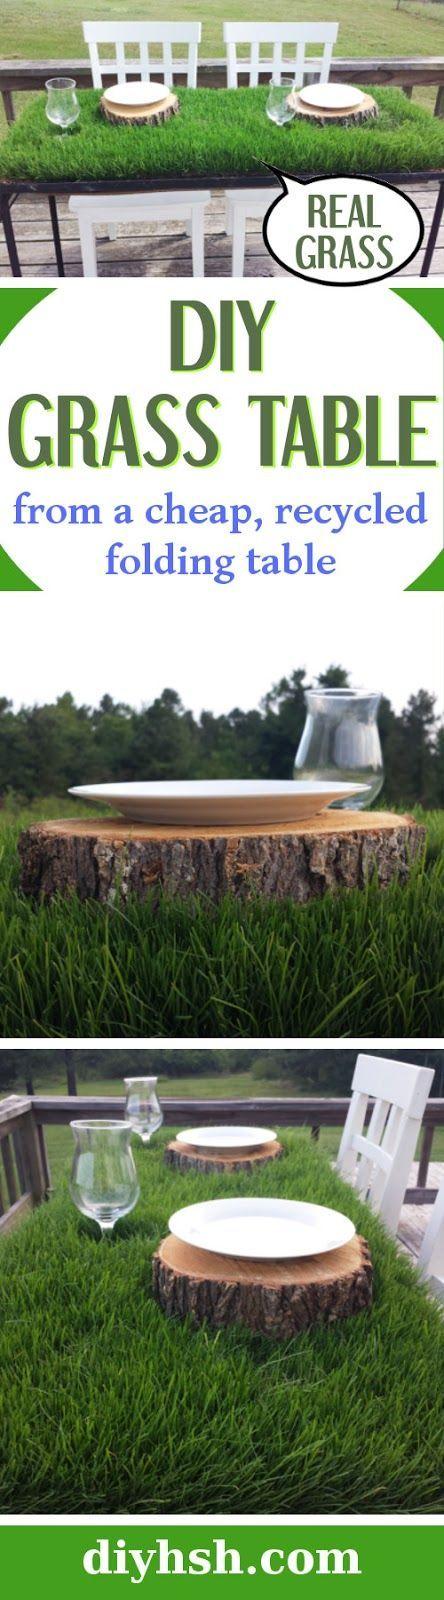 DIY Grass Table